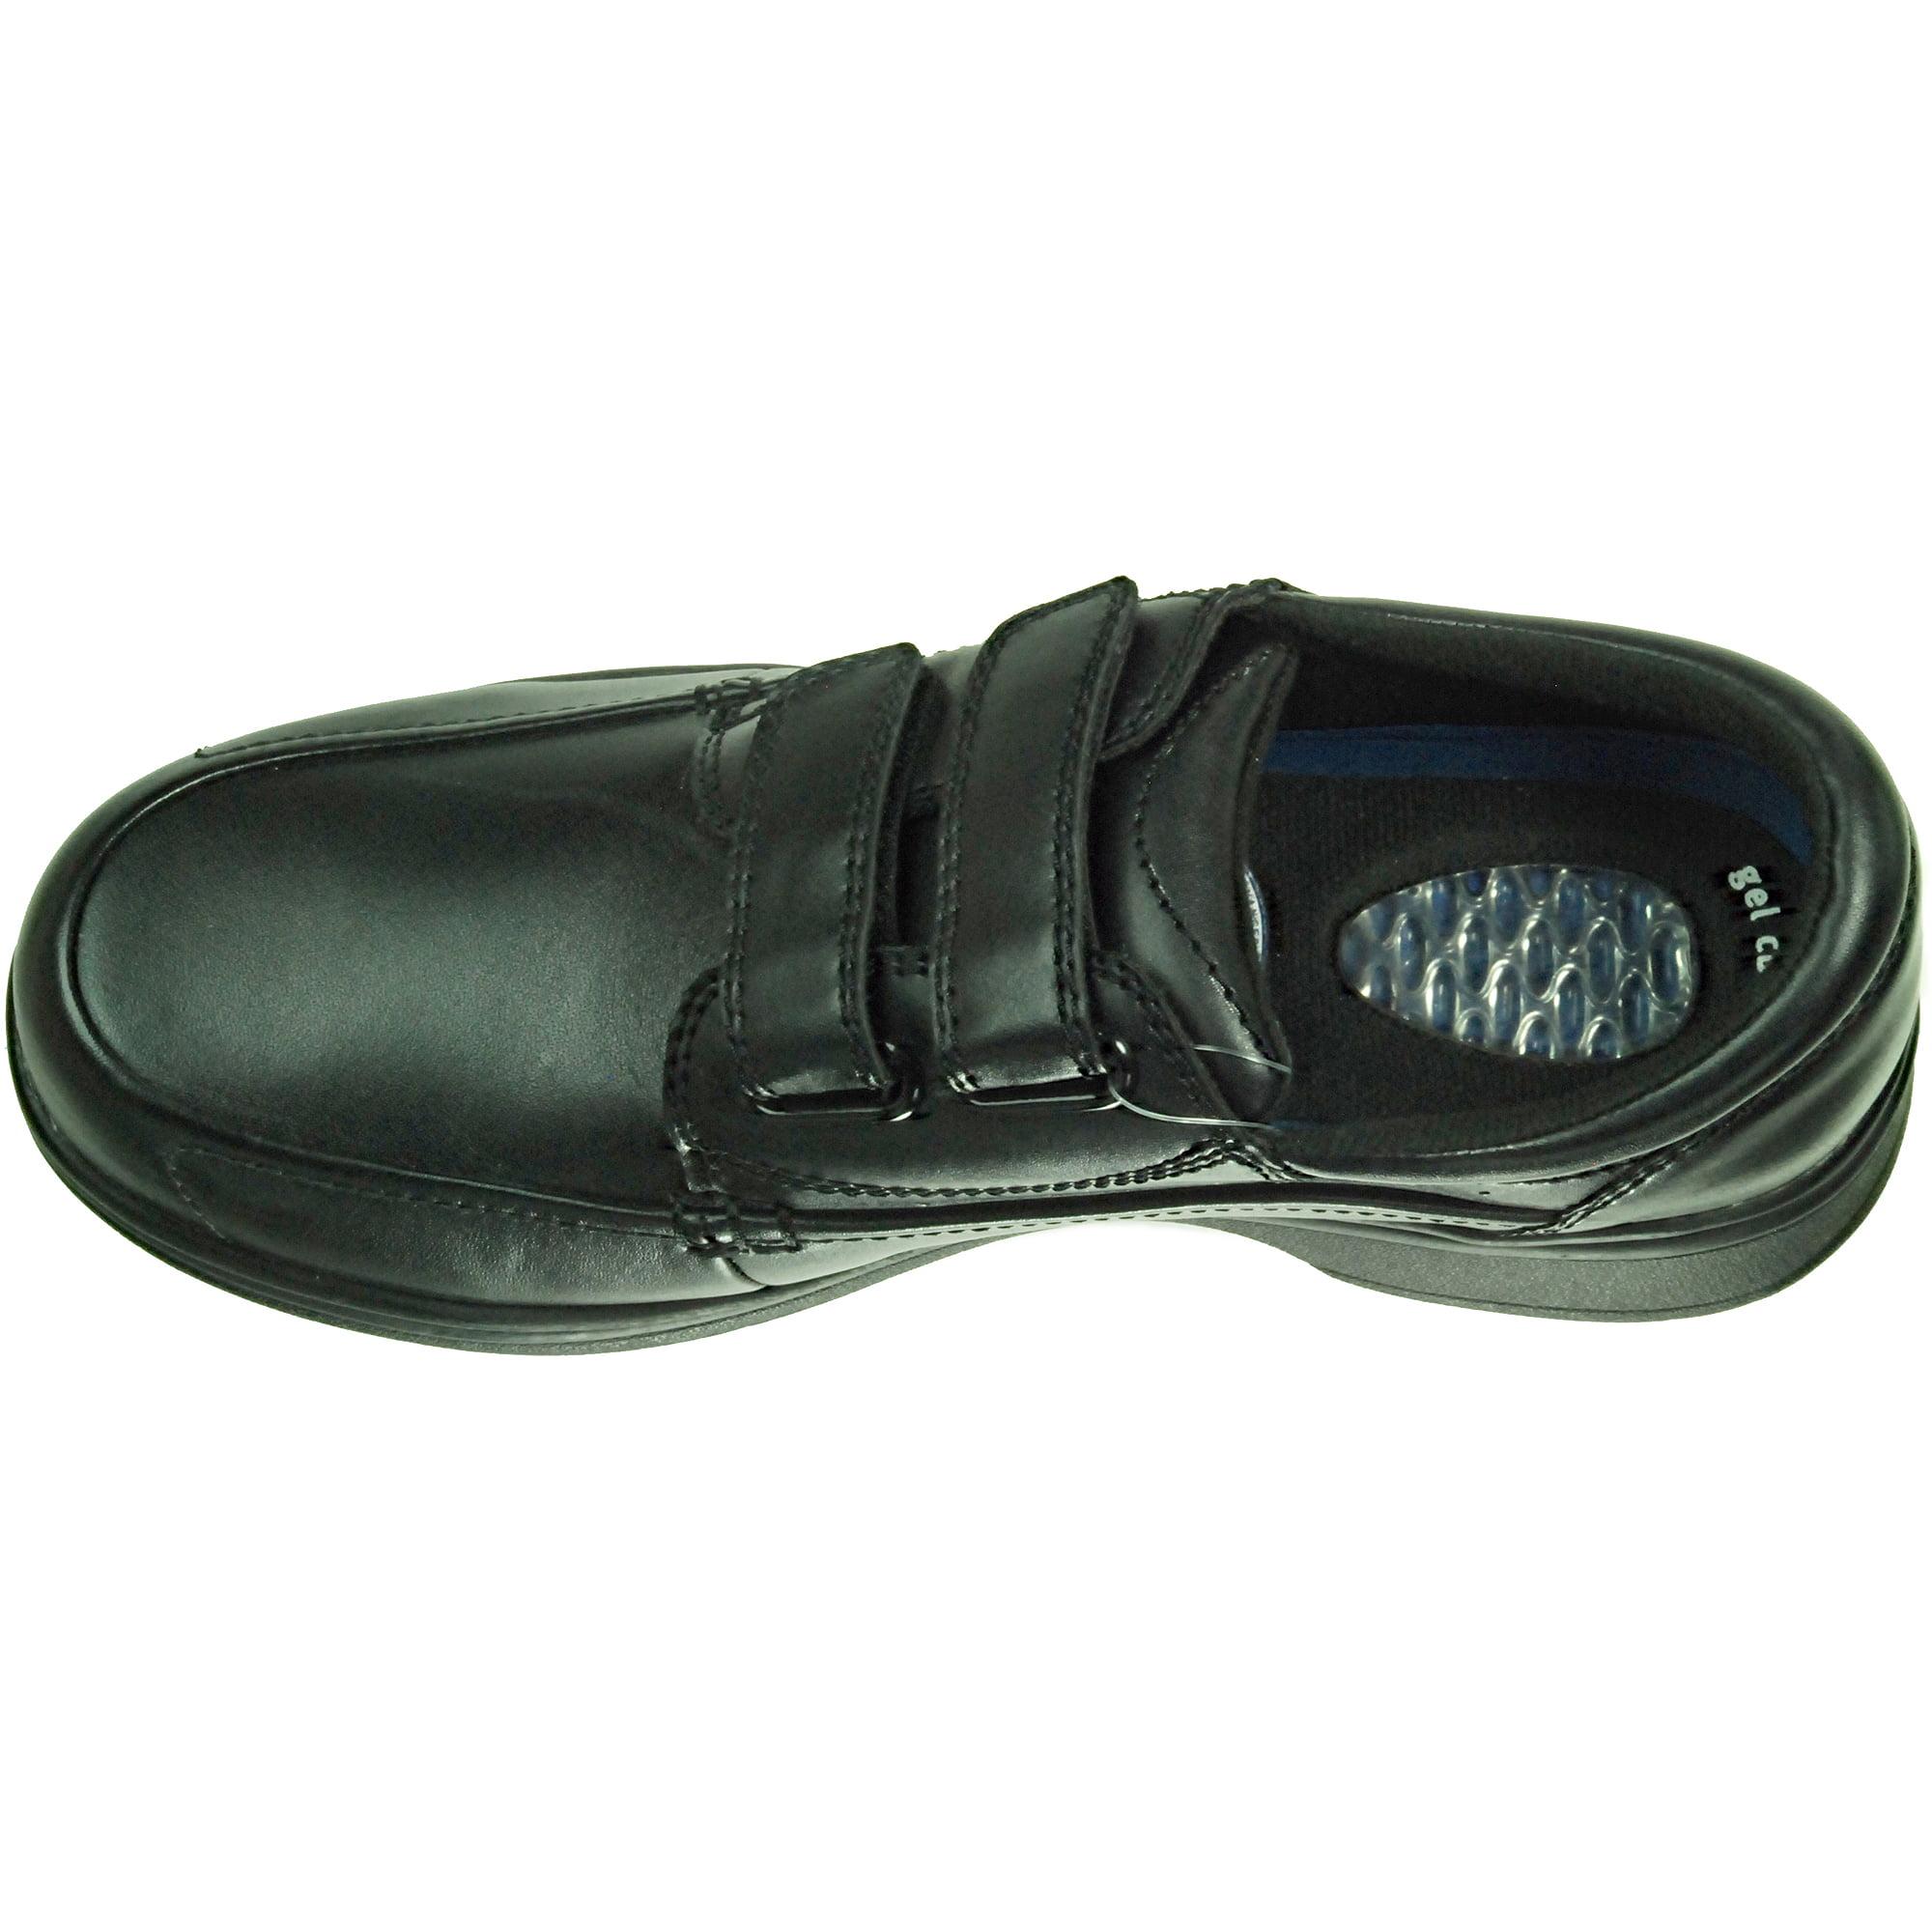 women doctor s dr scholl womens comfort nordstrom comforter slides c mules shoes